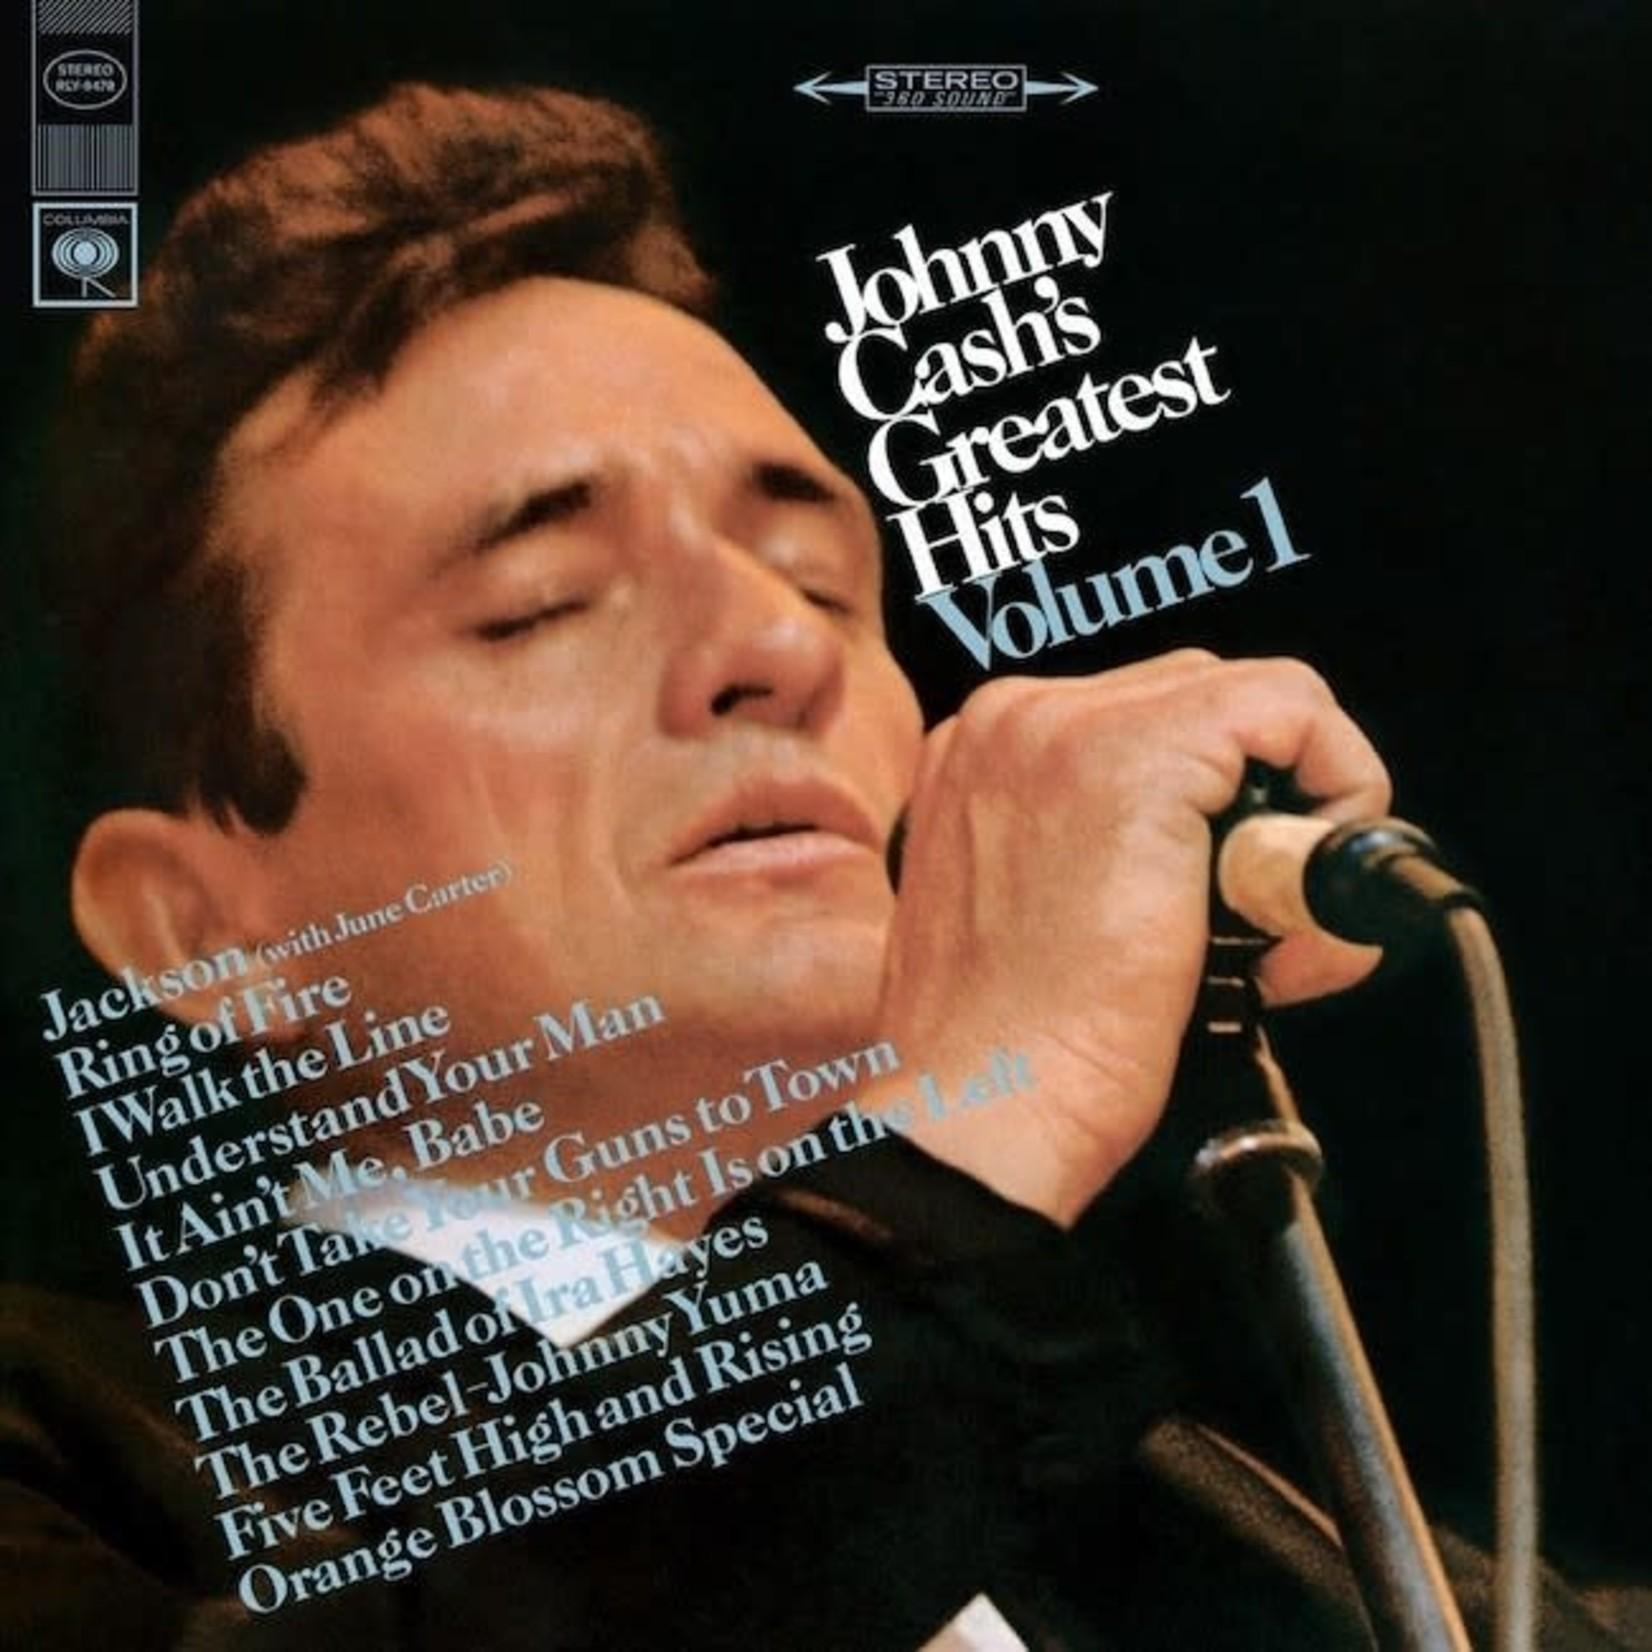 [Vintage] Cash, Johnny: Greatest Hits Volume. 1